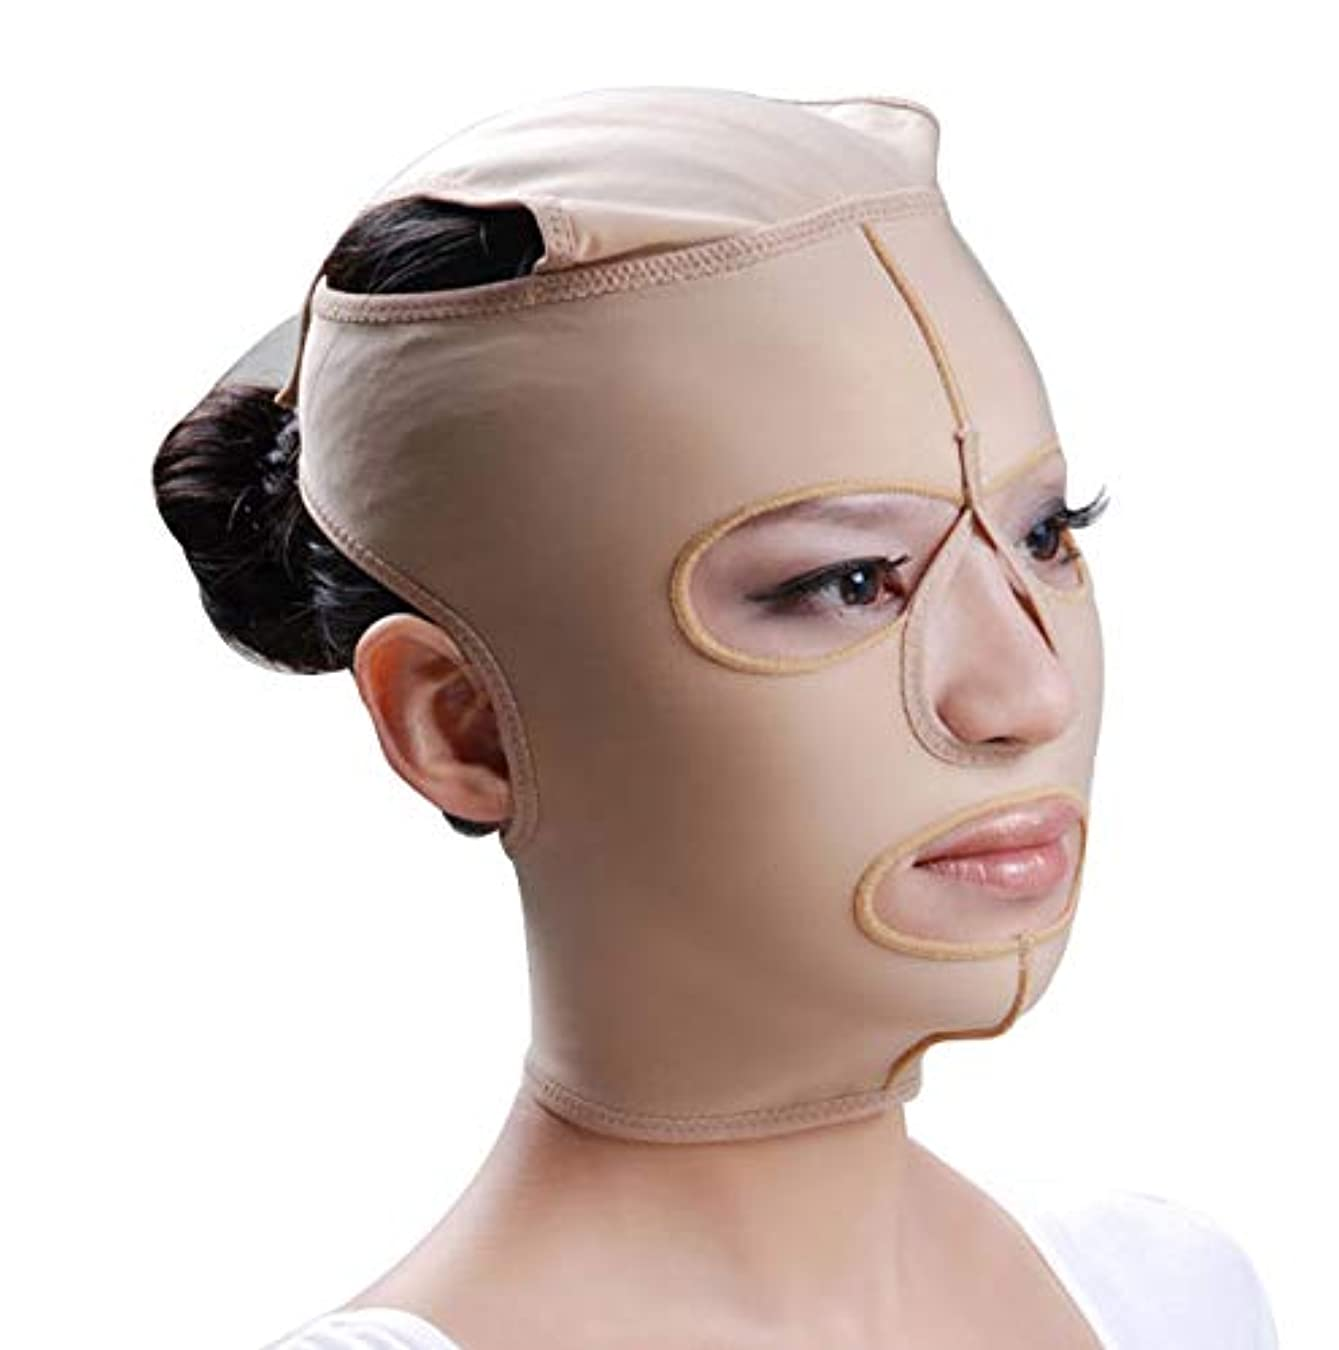 XHLMRMJ 引き締めフェイスマスク、フェイシャルマスク弾性フェイスリフティングリフティング引き締めパターンマイクロ仕上げポストモデリング圧縮フェイスマスク (Size : S)